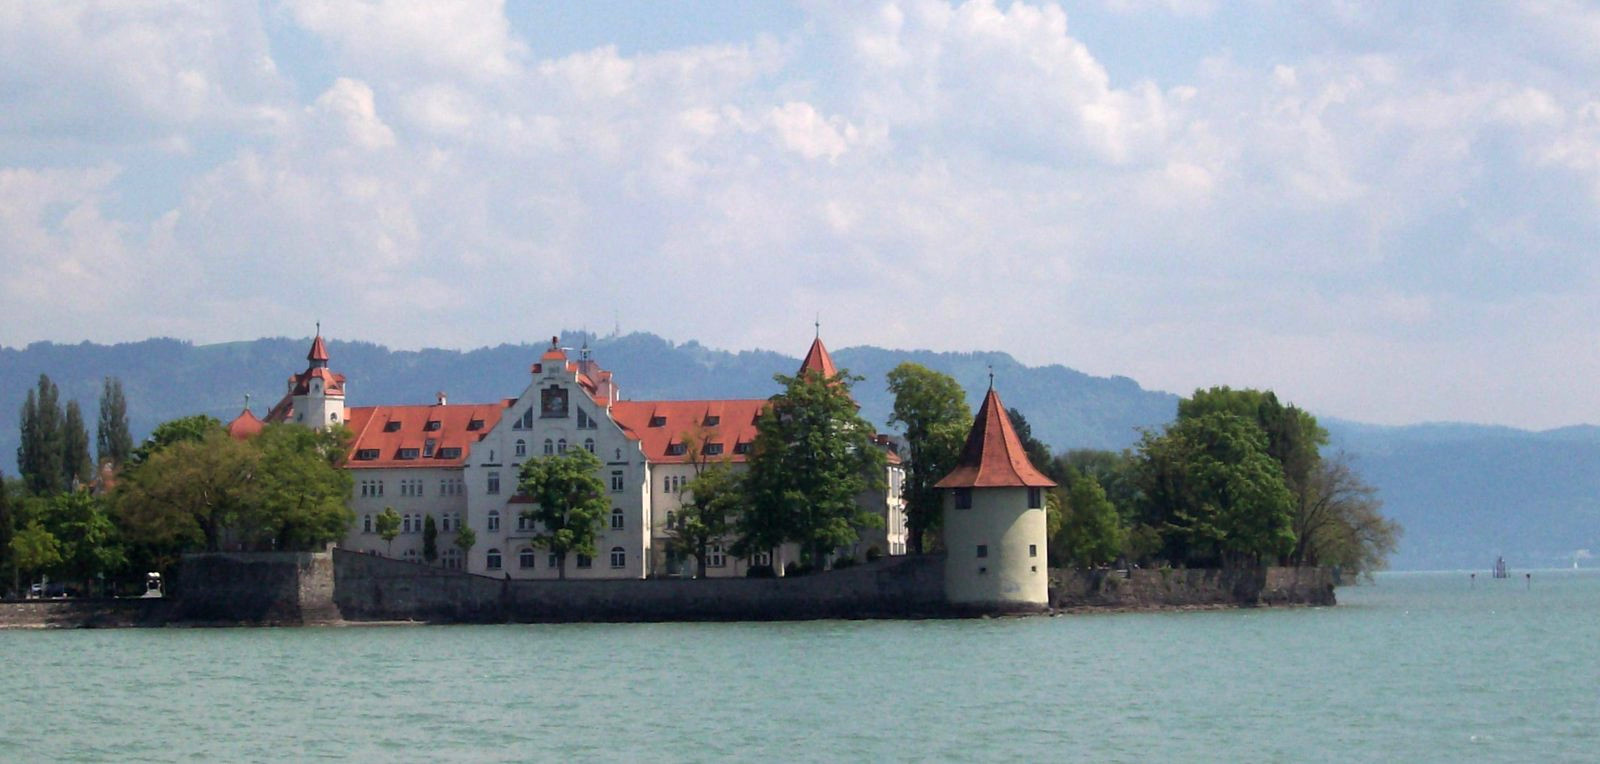 Luitpoldkaserne in Lindau am Bodensee